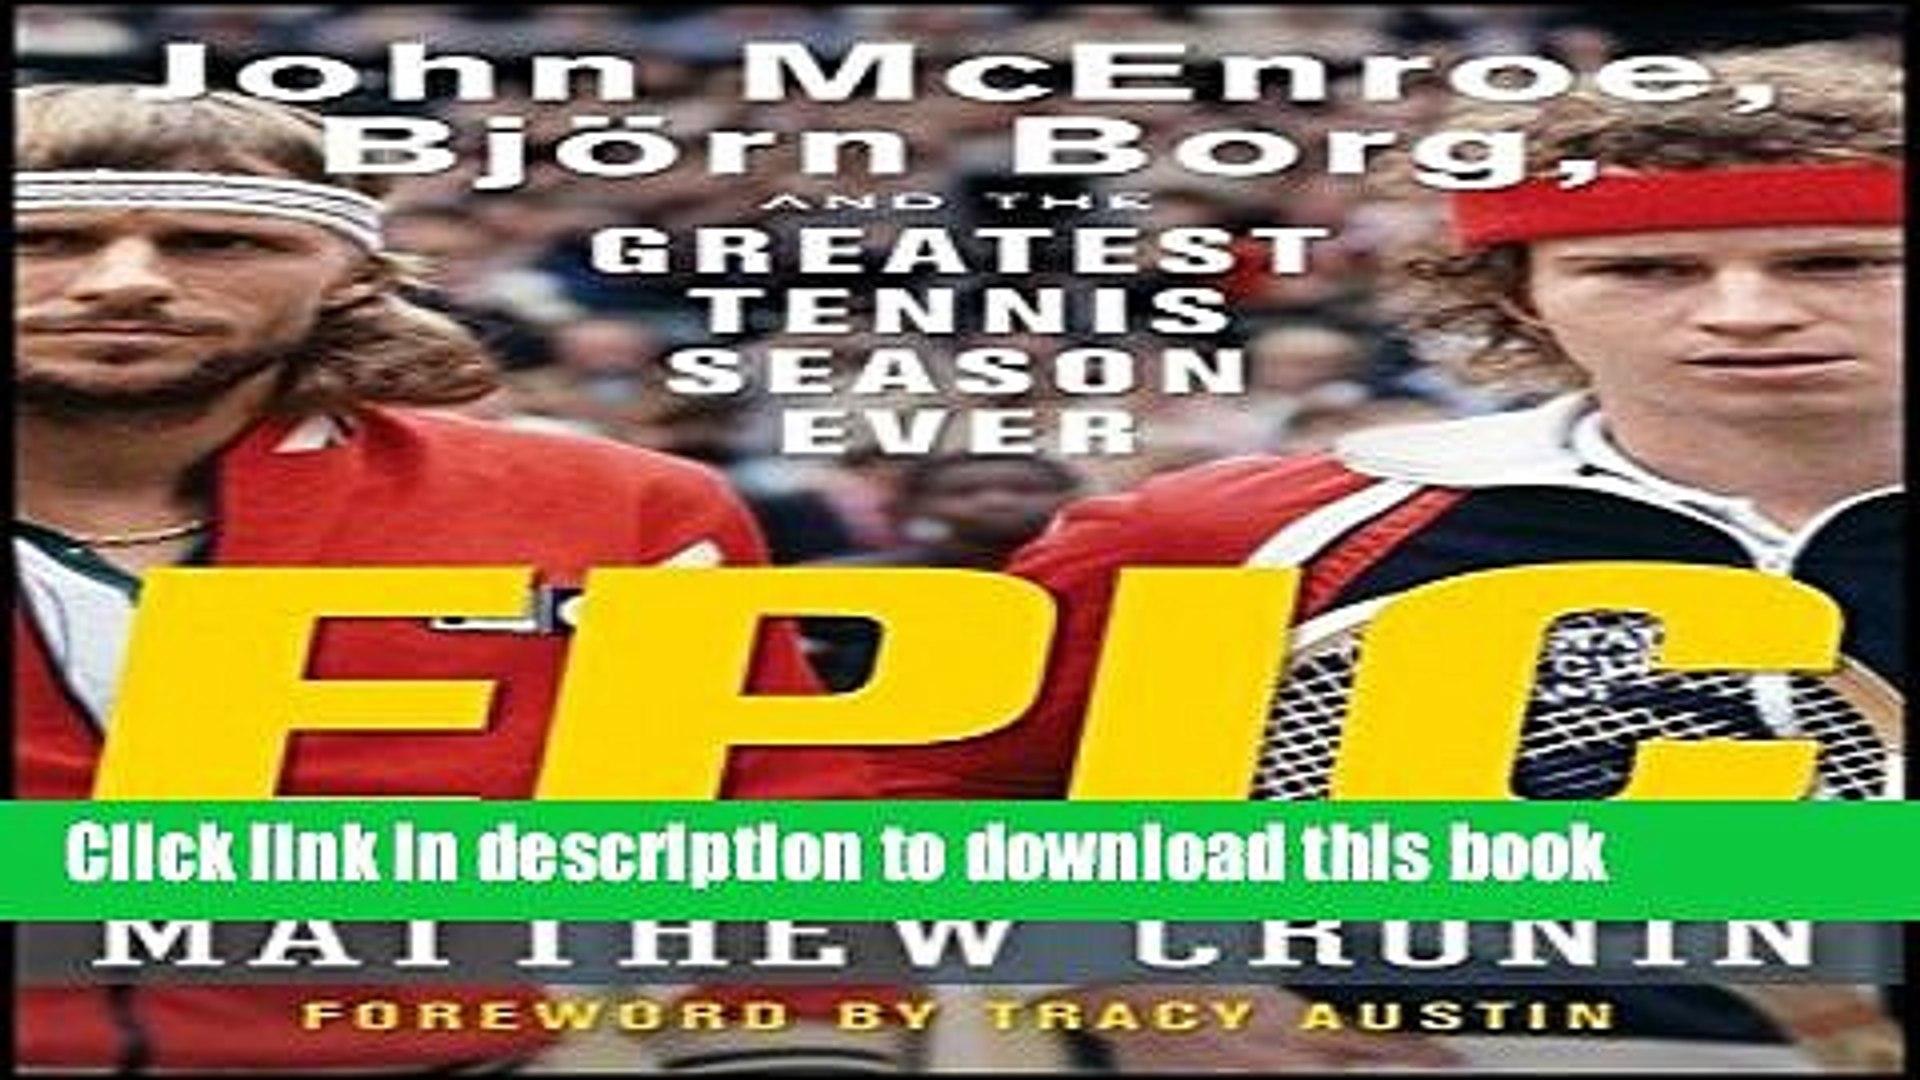 Books Epic: John McEnroe, Bjrn Borg, and the Greatest Tennis Season Ever  Full Download